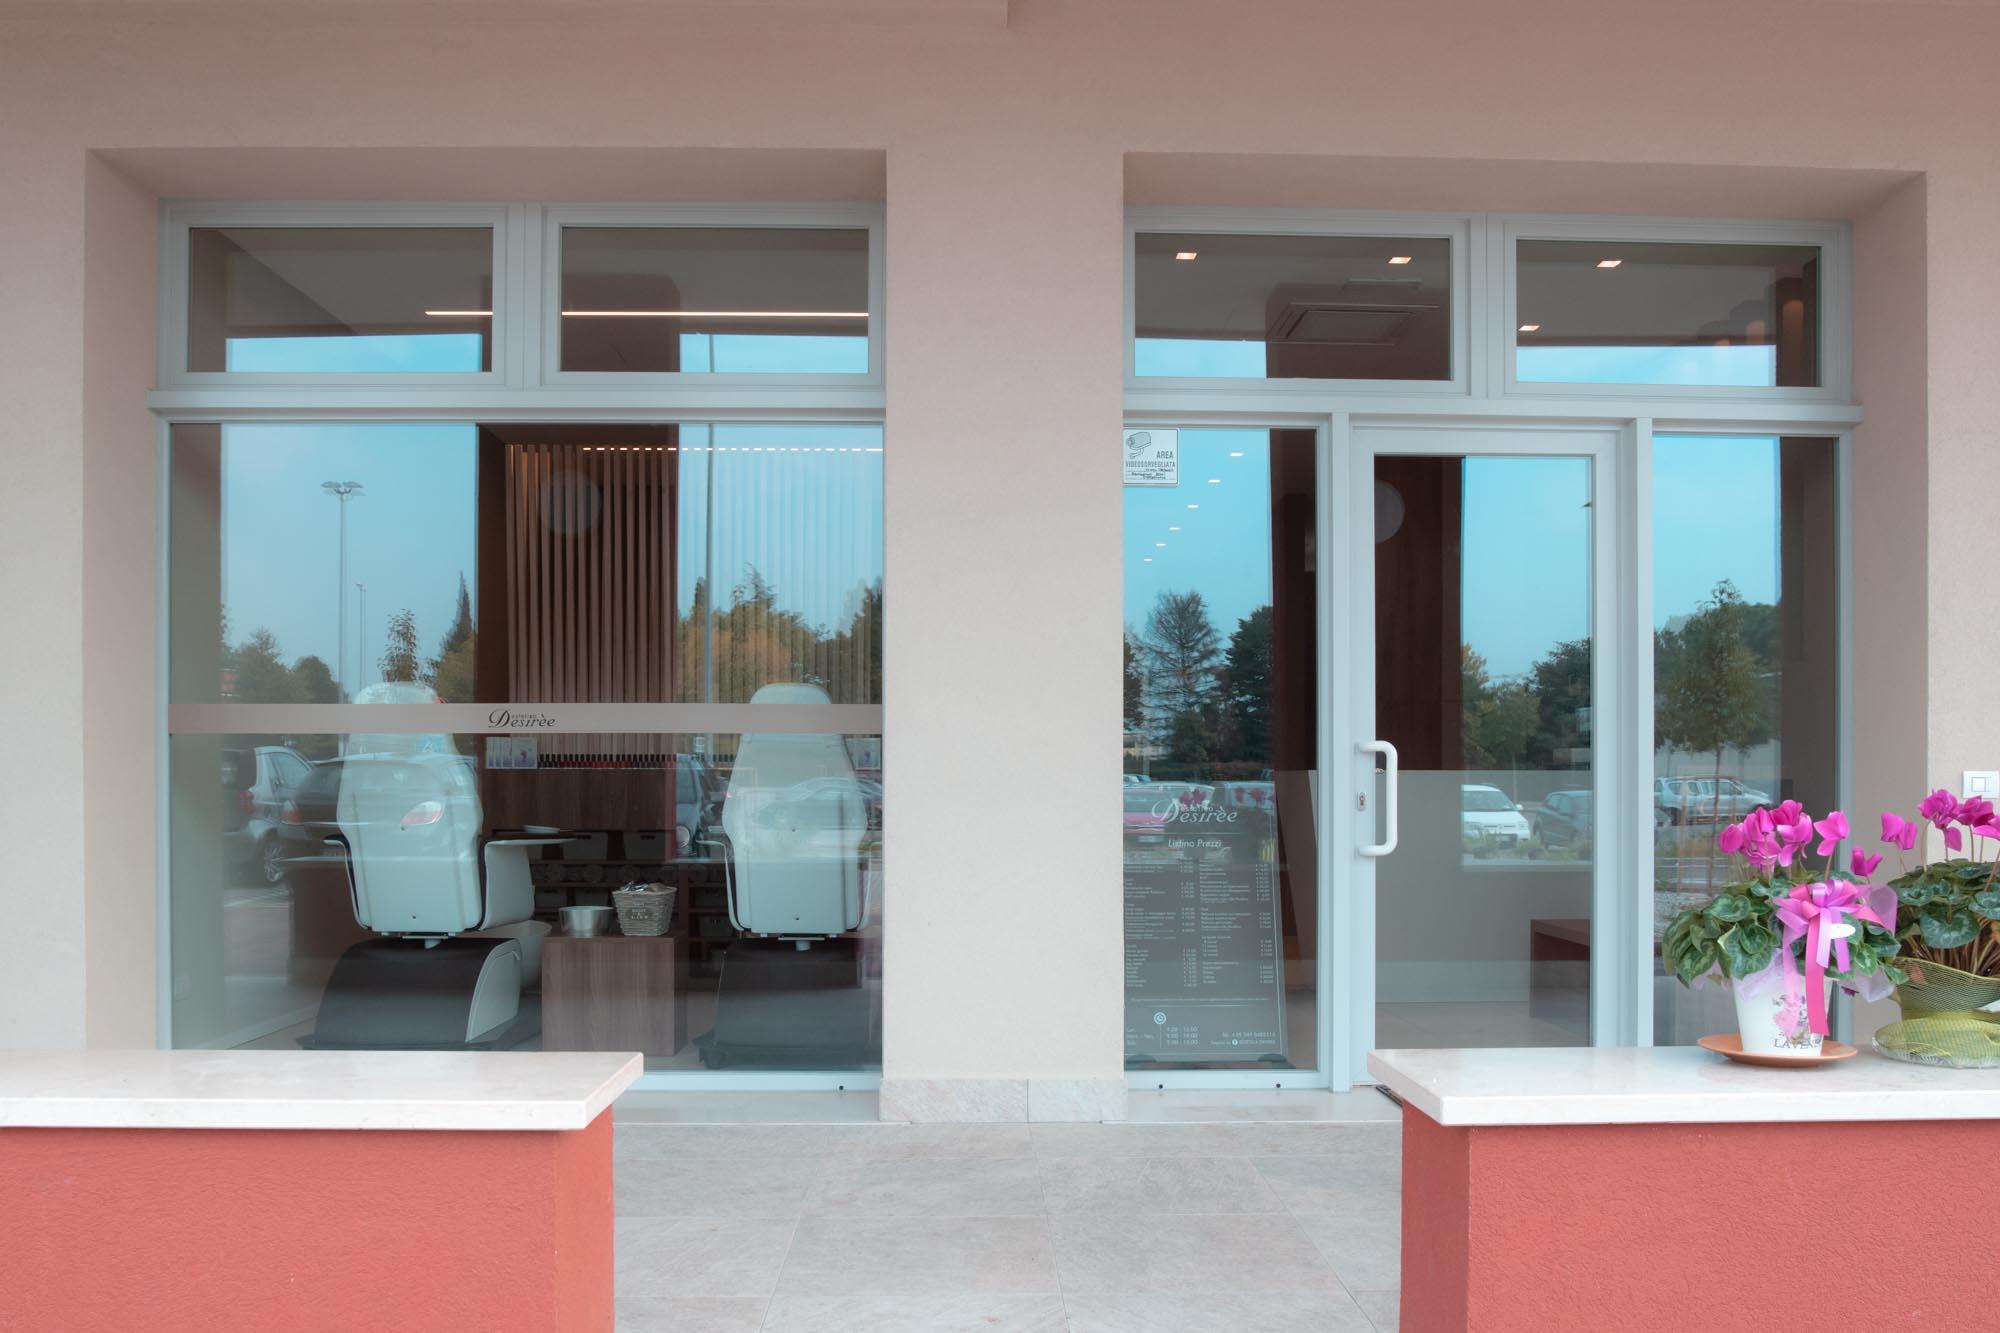 Centro estetico Desirèe entrata